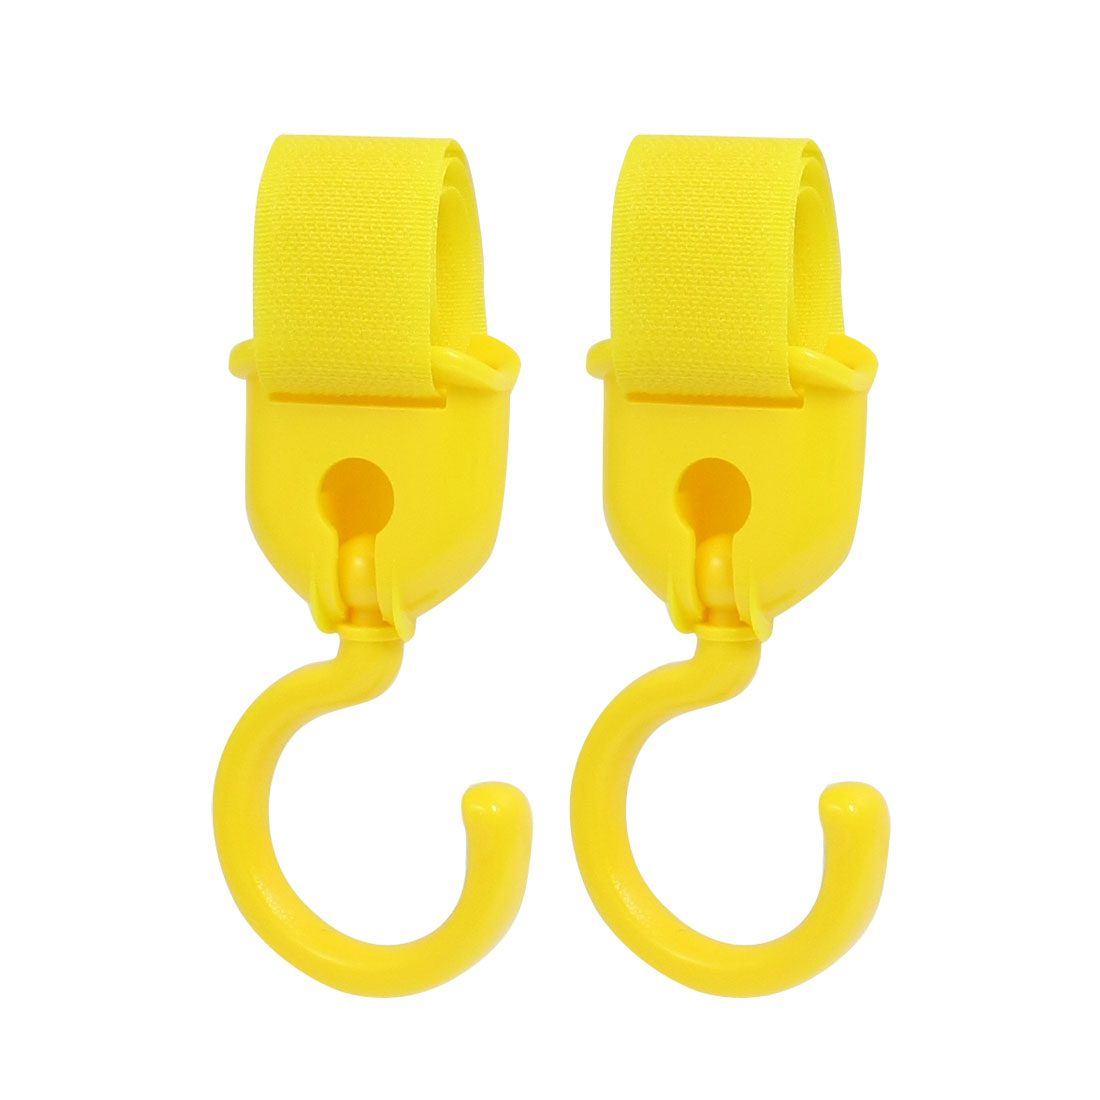 2 Pcs Swivel Baby Stroller Hanger Pram Pushchair Hook Yellow 2kg